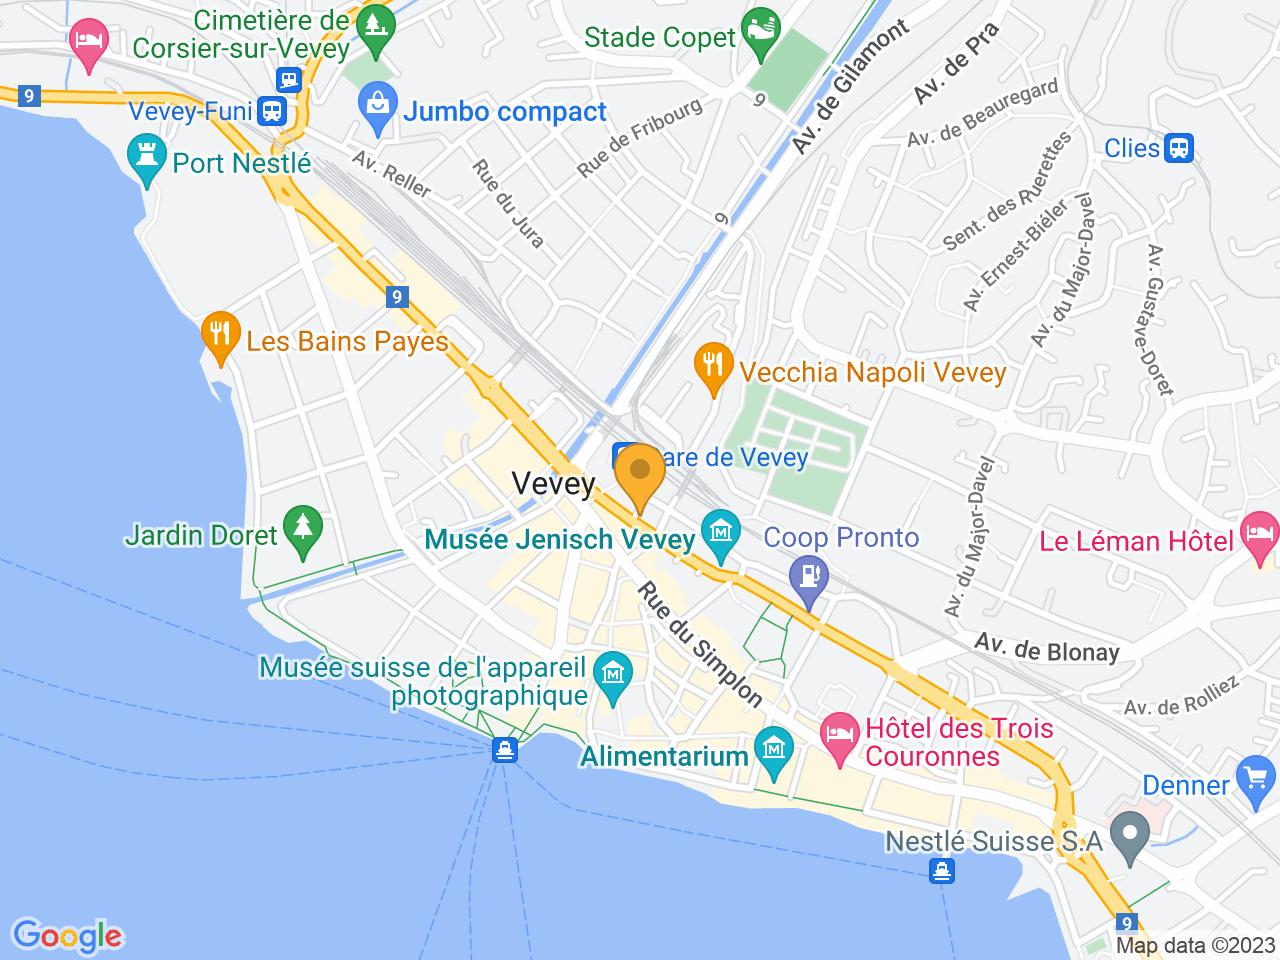 Avenue de la Gare 16, 1800 Vevey